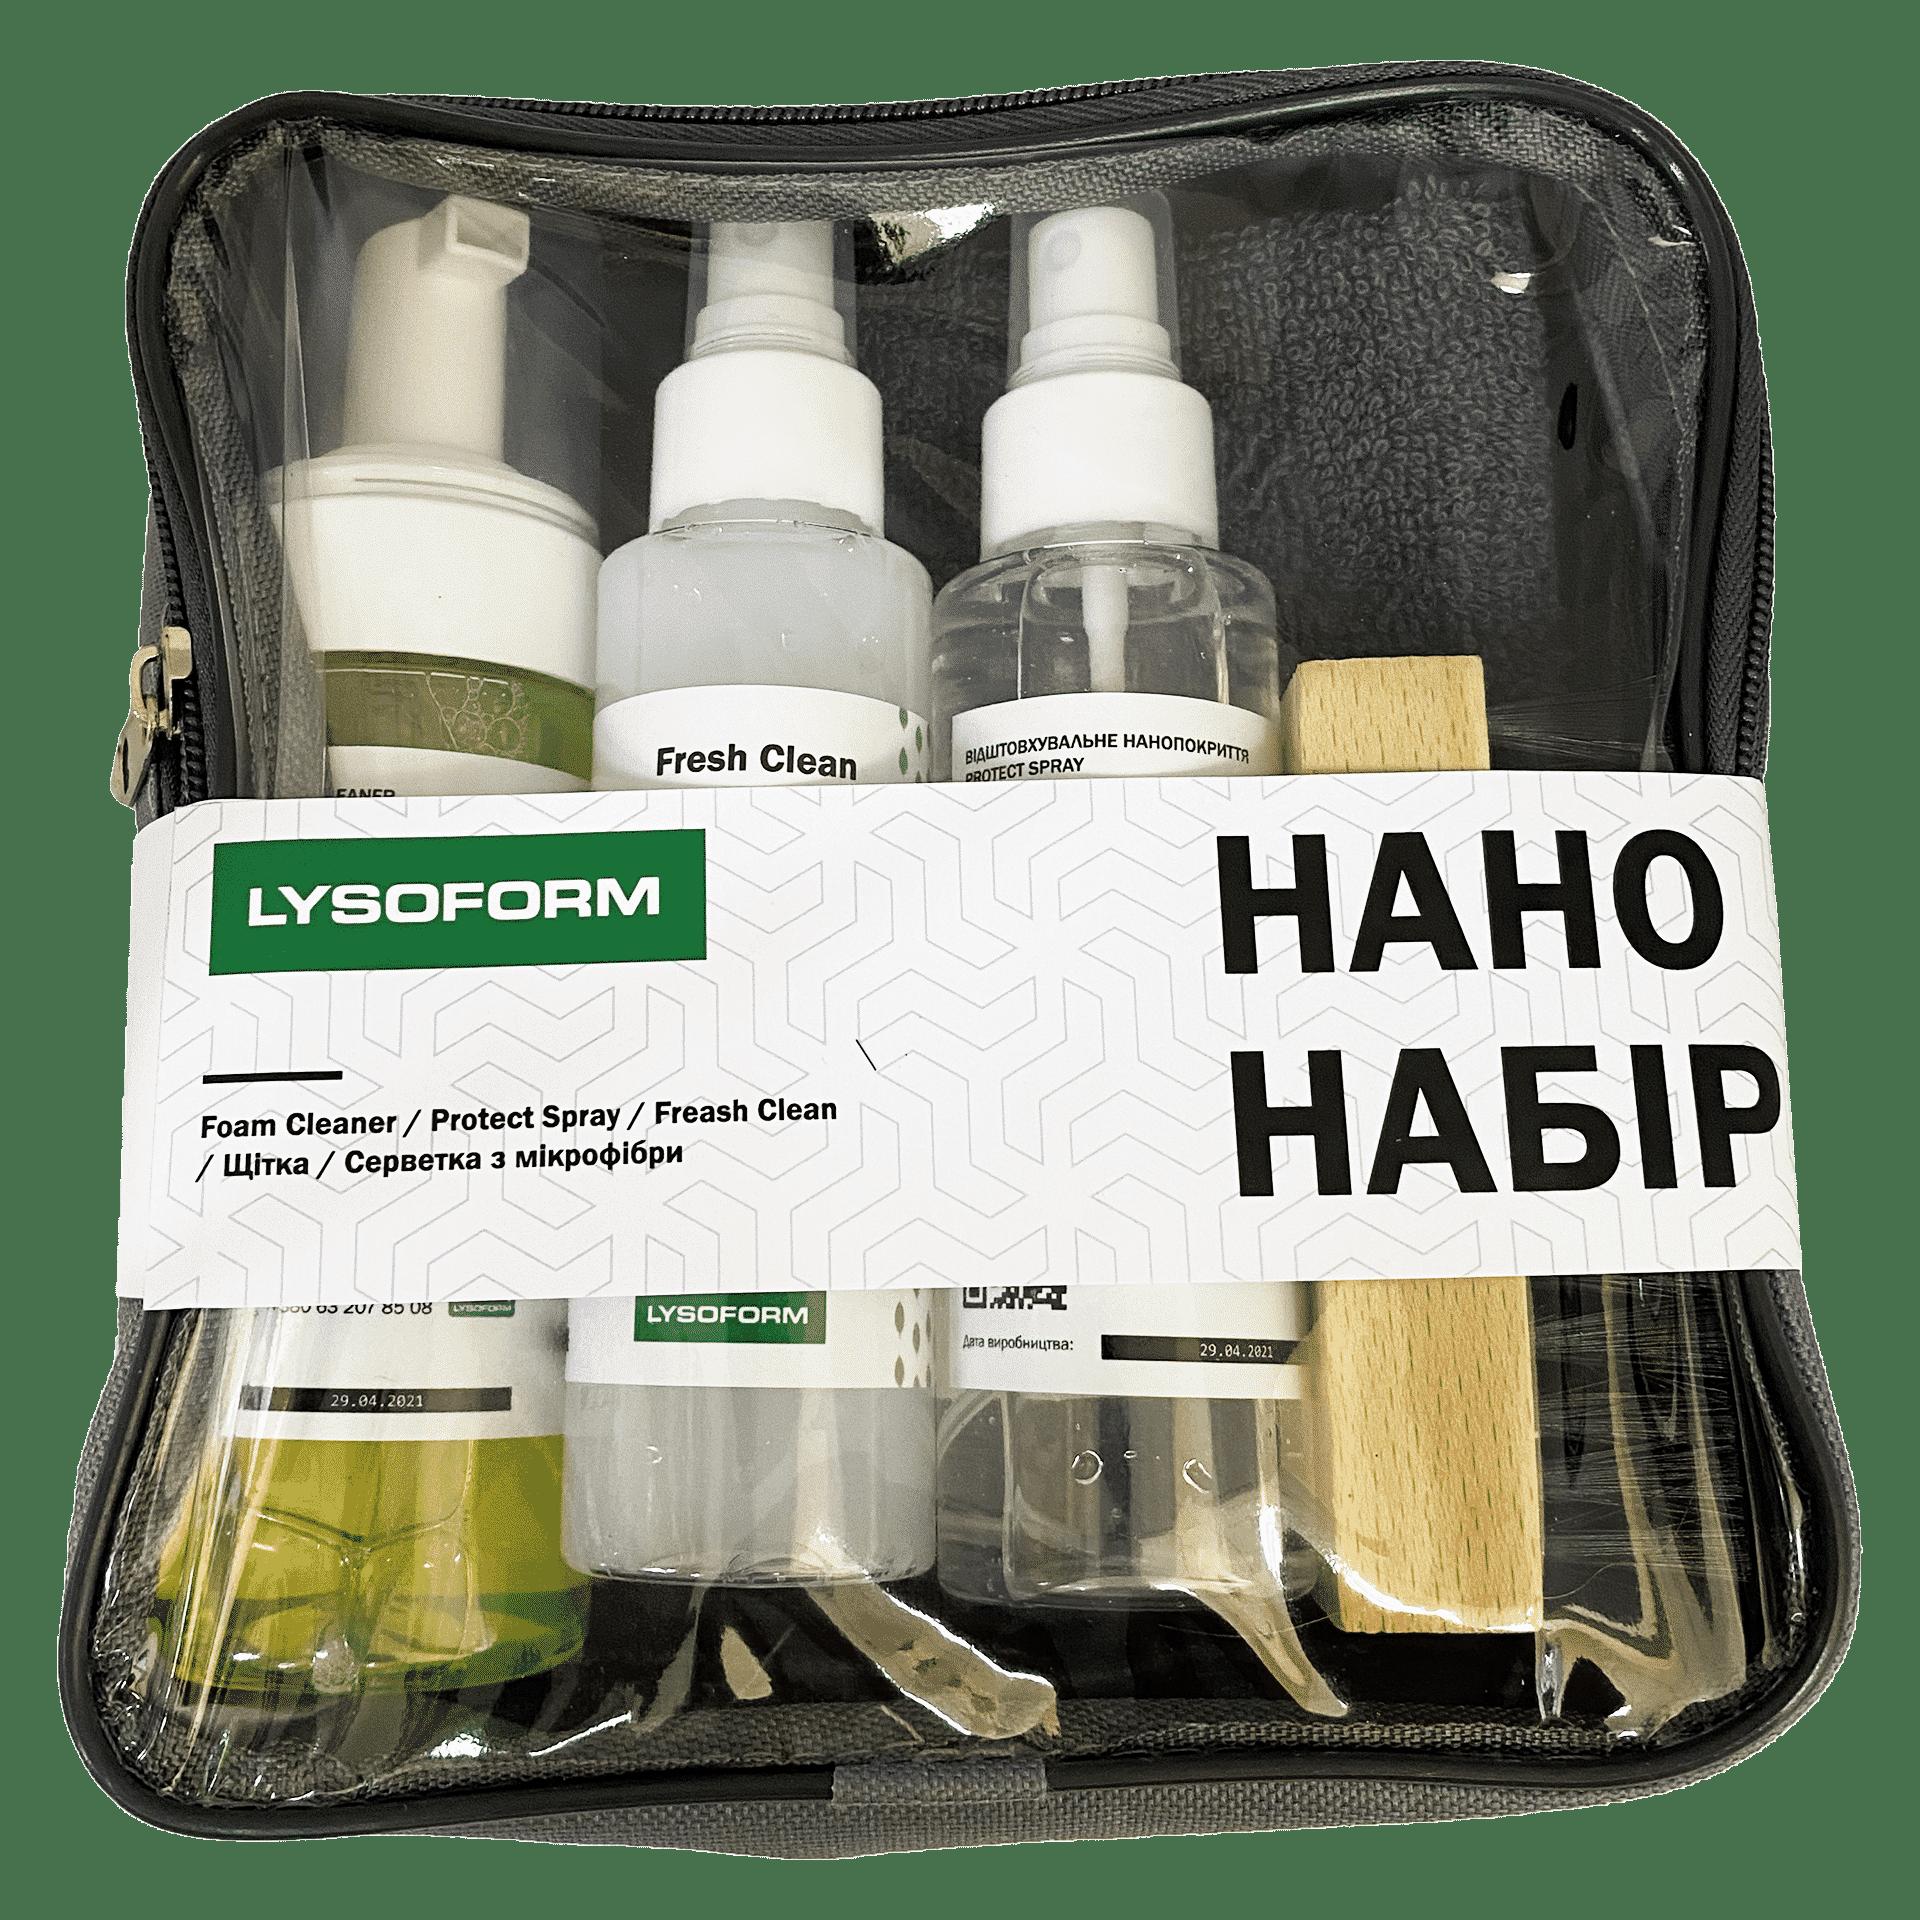 Нано-Набір Lysoform